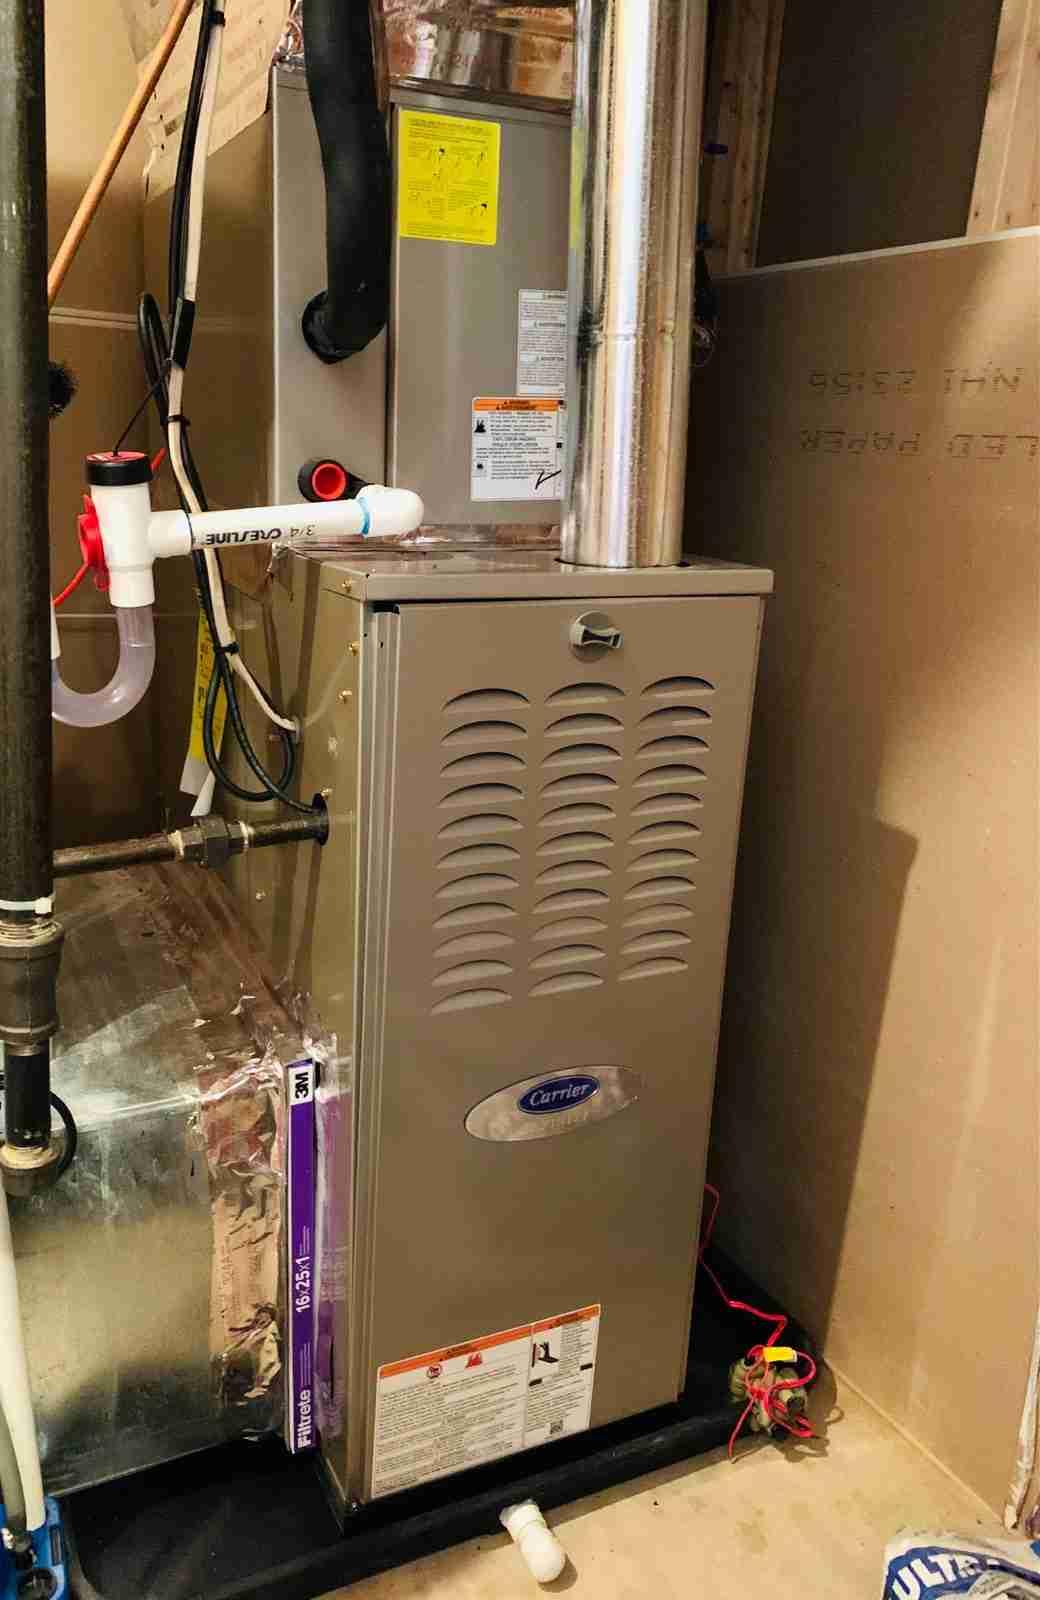 carrier furnace replacement in Manassas Virginia